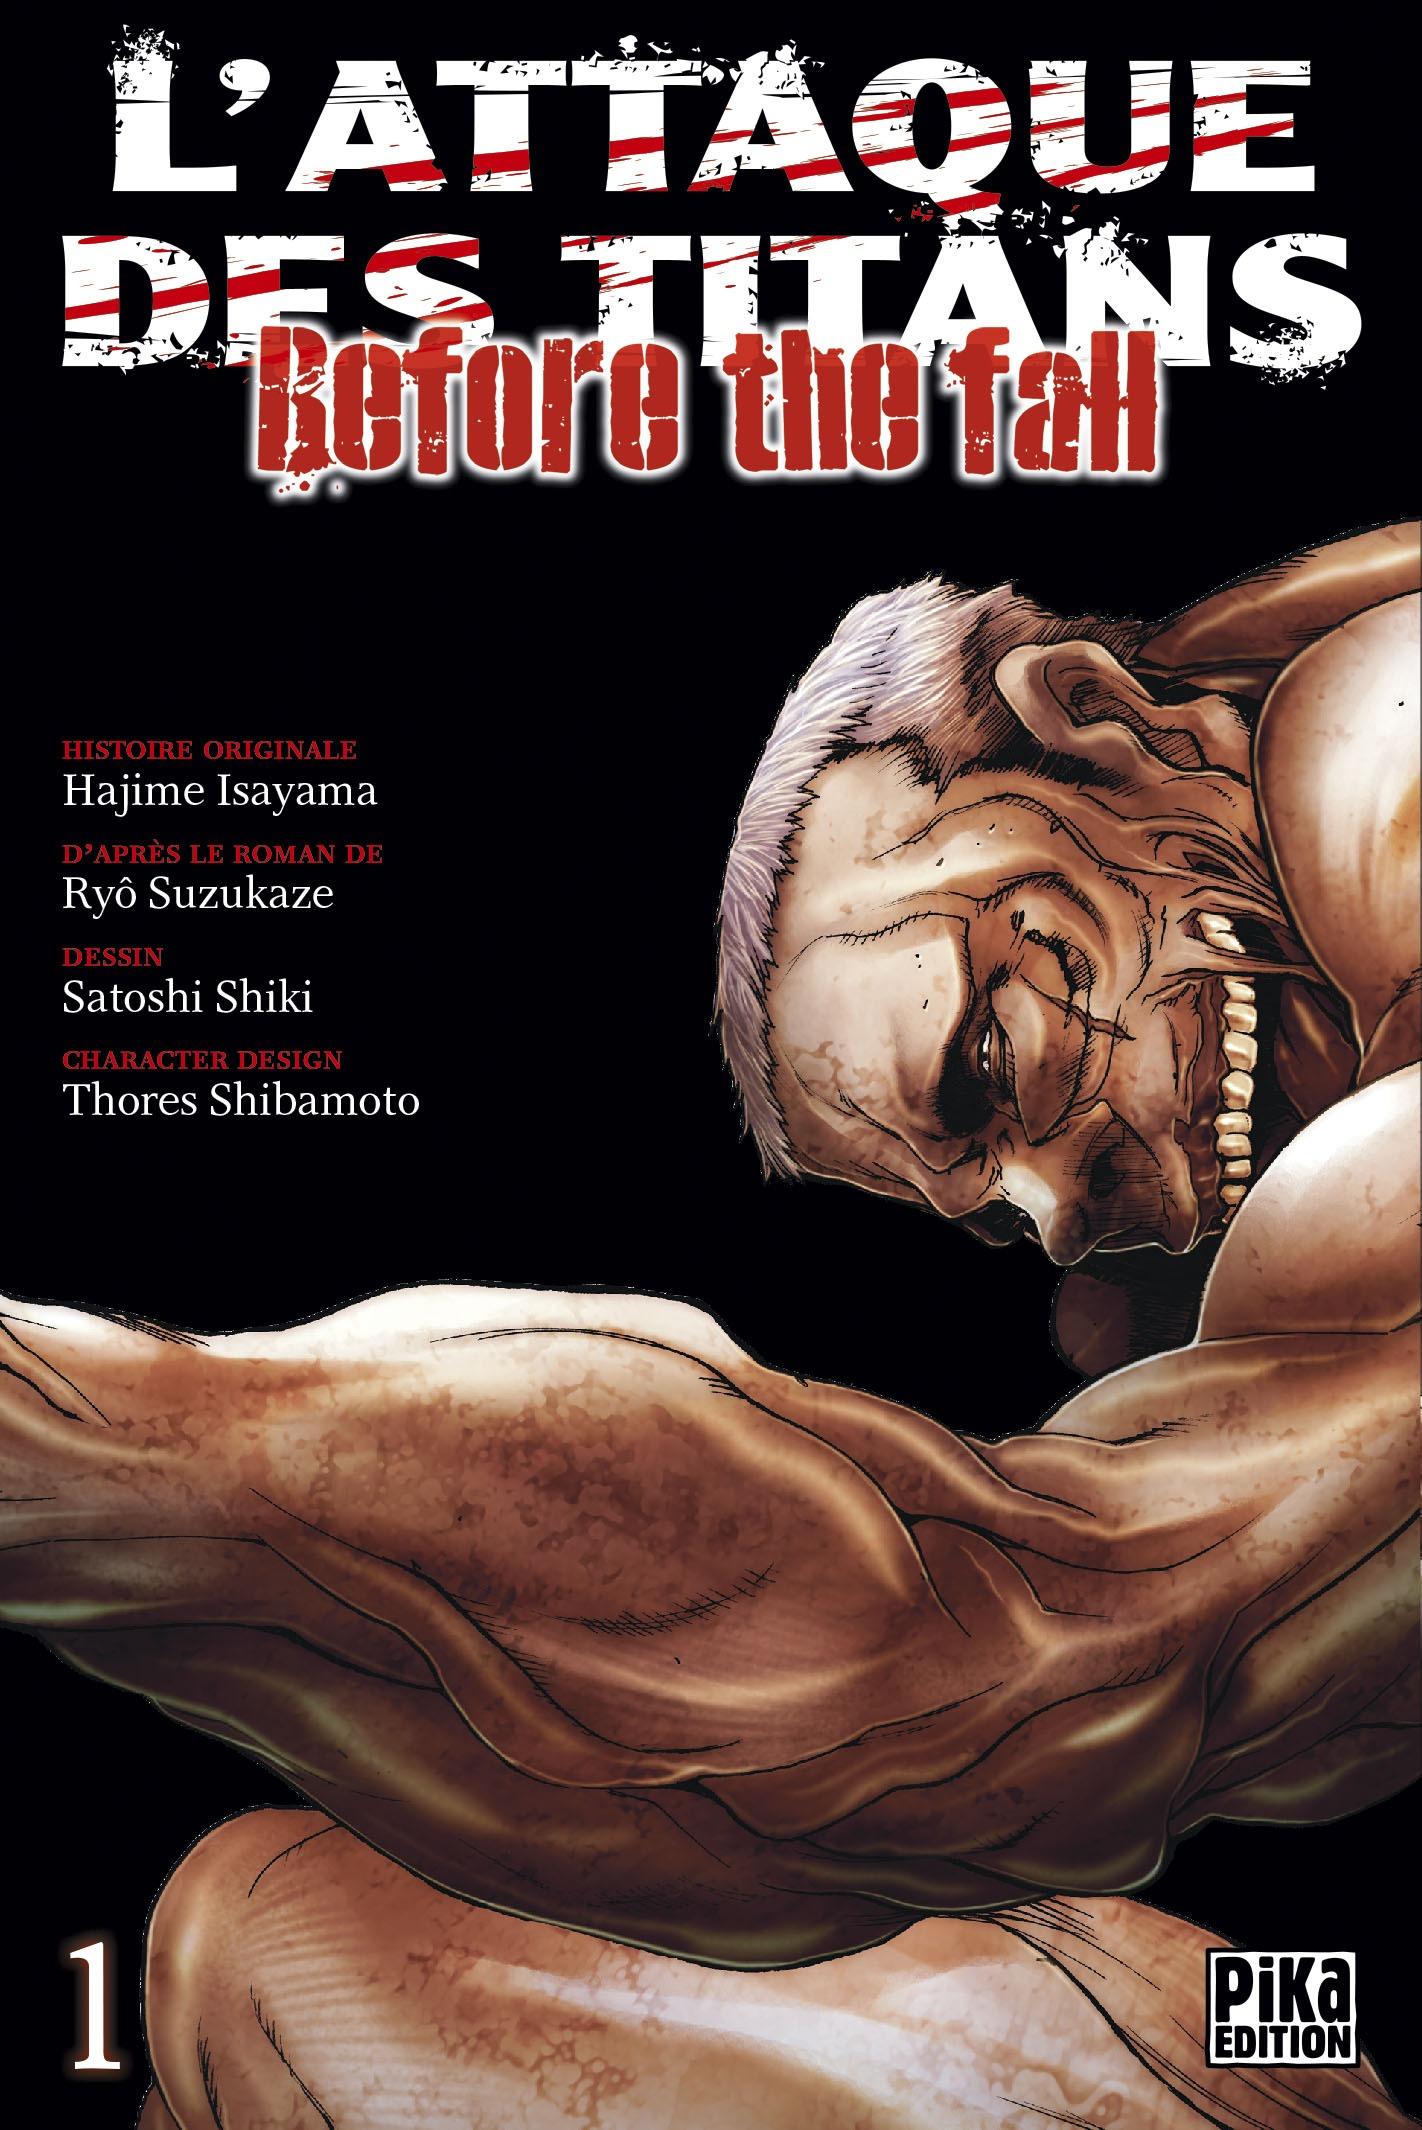 L'attaque des titans before the fall, Manga, Shônen